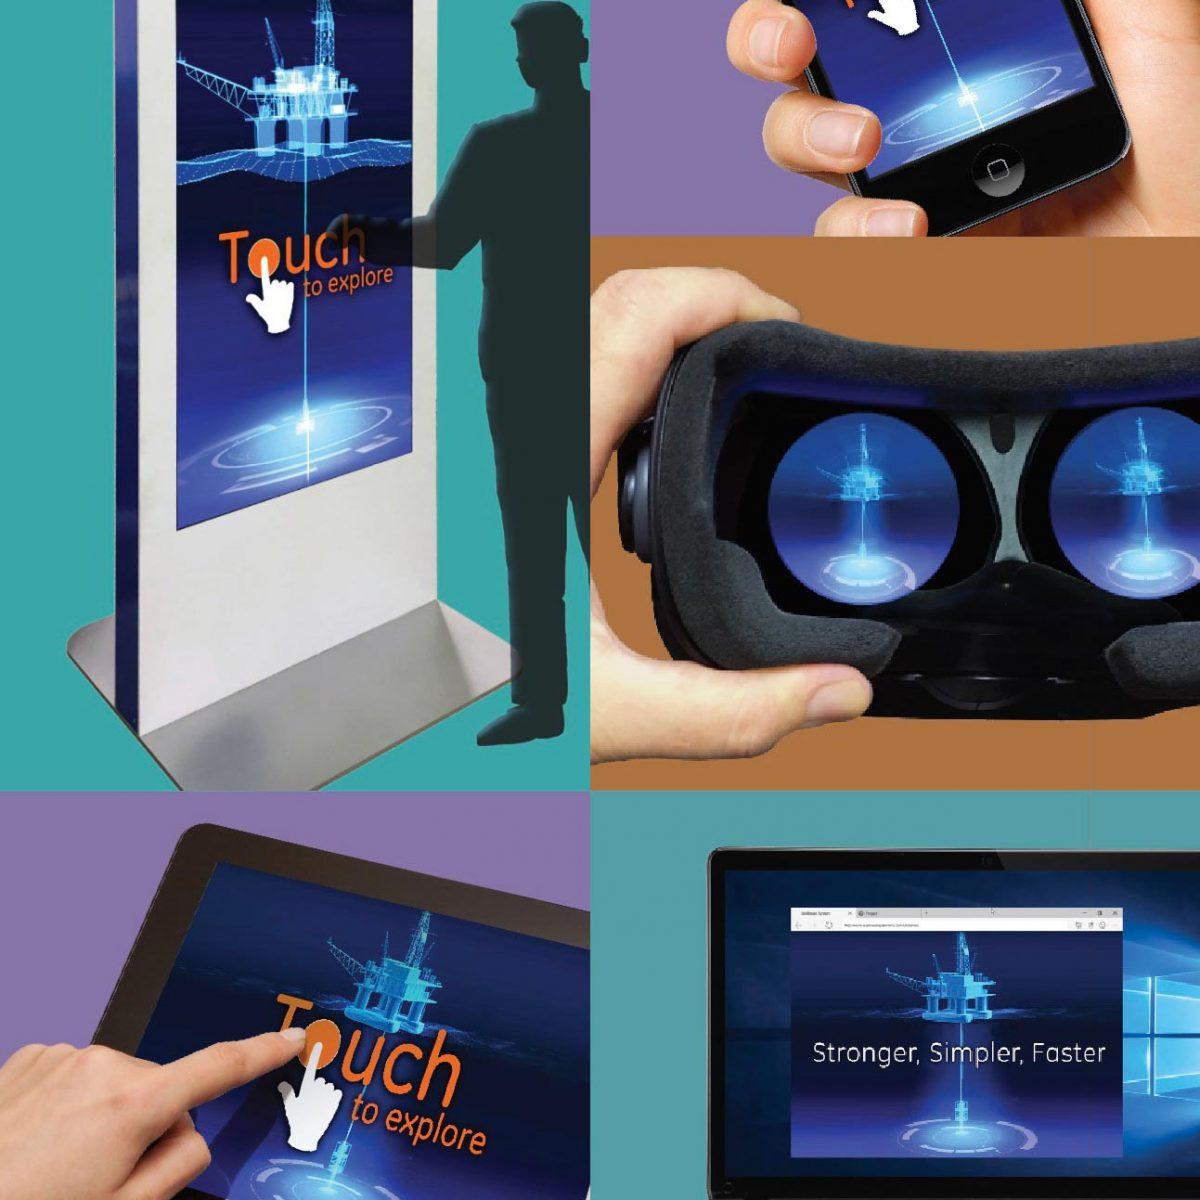 virtual reality interactive technology 3d exhibit booth design ideas synergy design group exhibitry headset kiosk